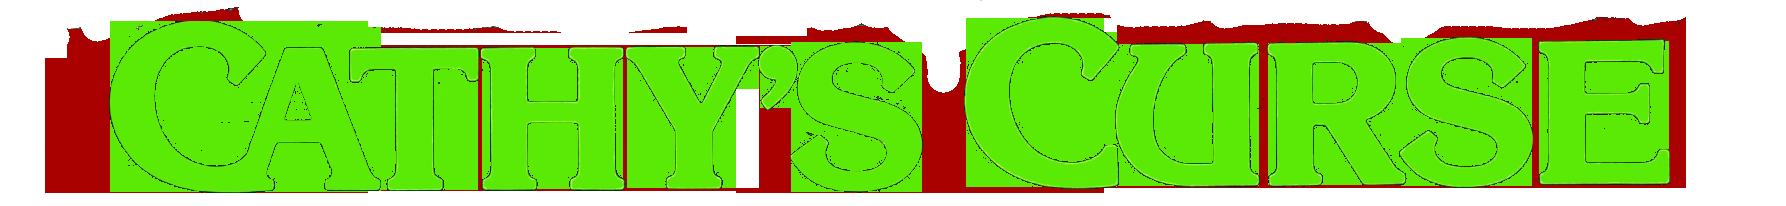 Cathy's Curse logo